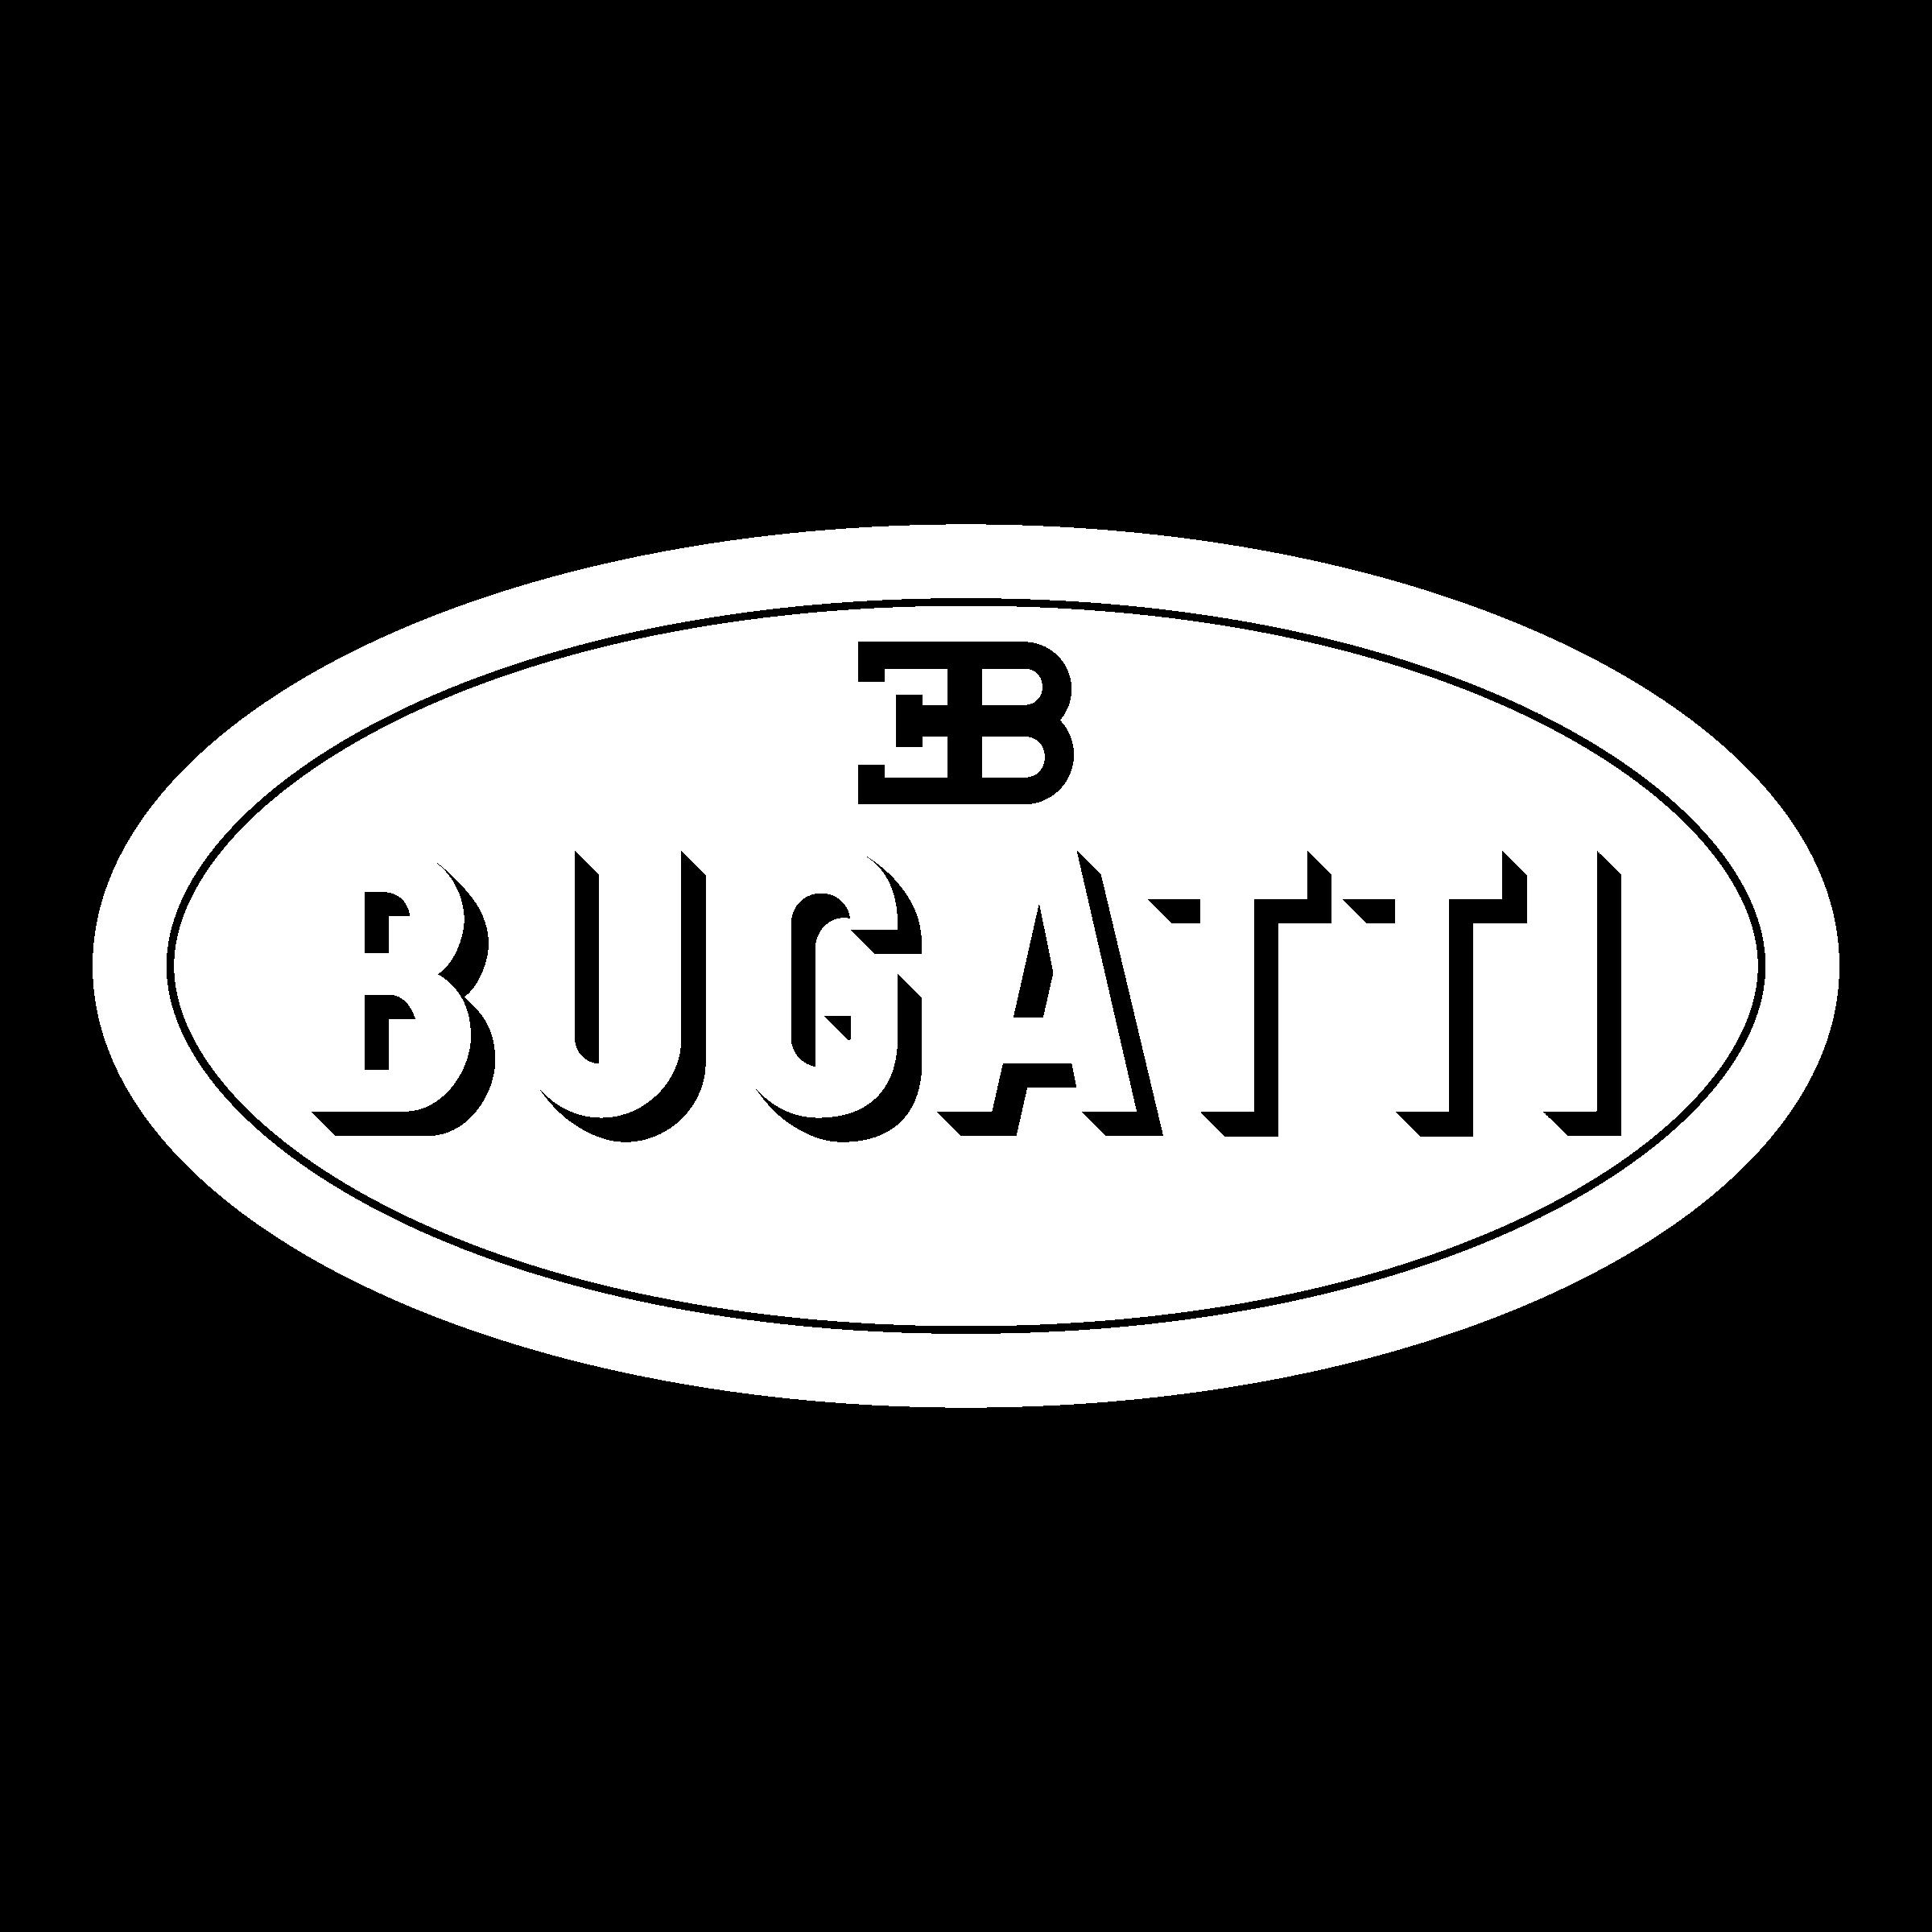 Bugatti Car Symbol Bugatti Logo Hd Png Meaning Information